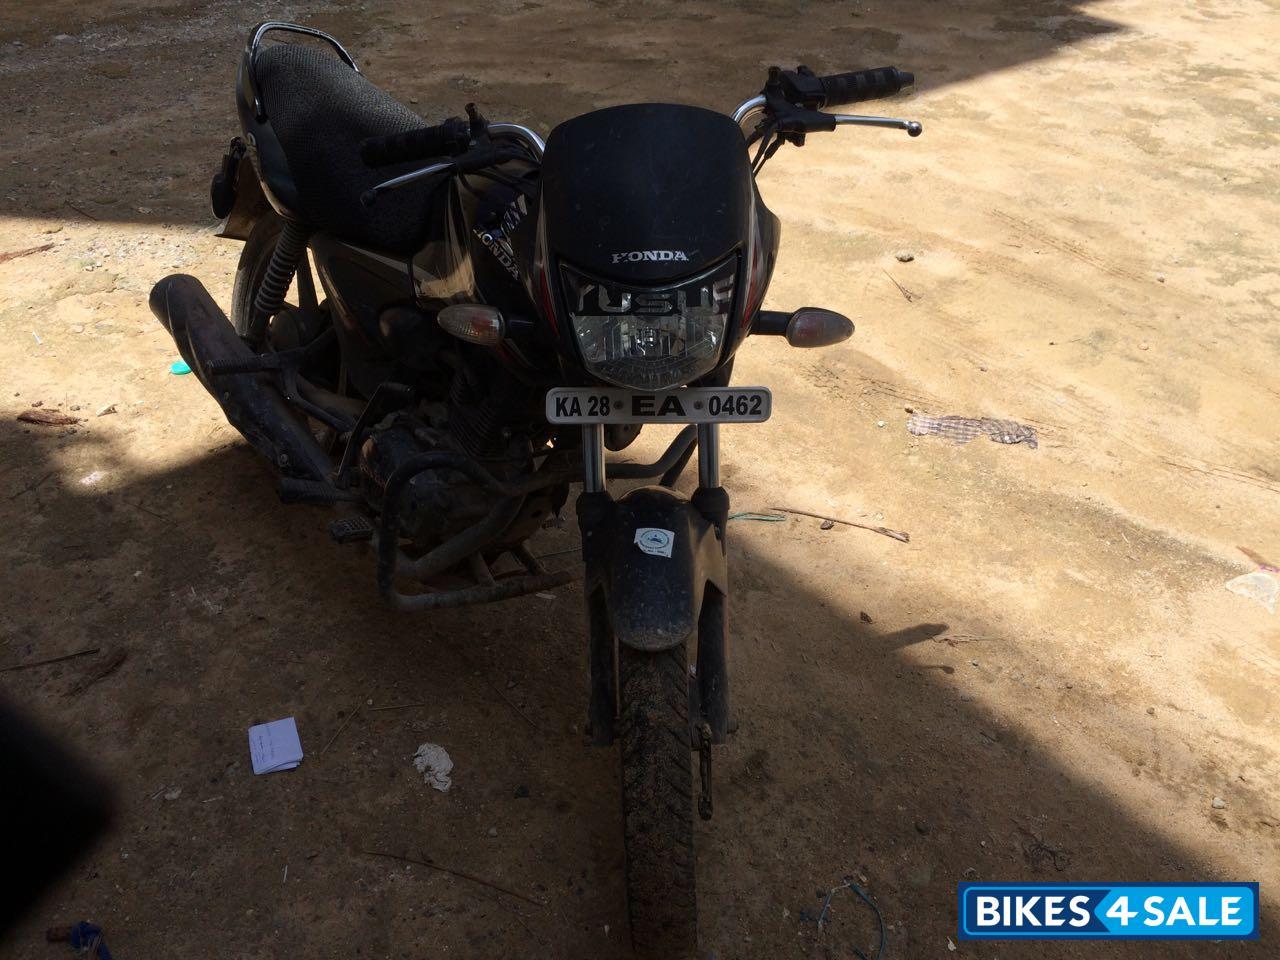 4 wheel bike price in bangalore dating